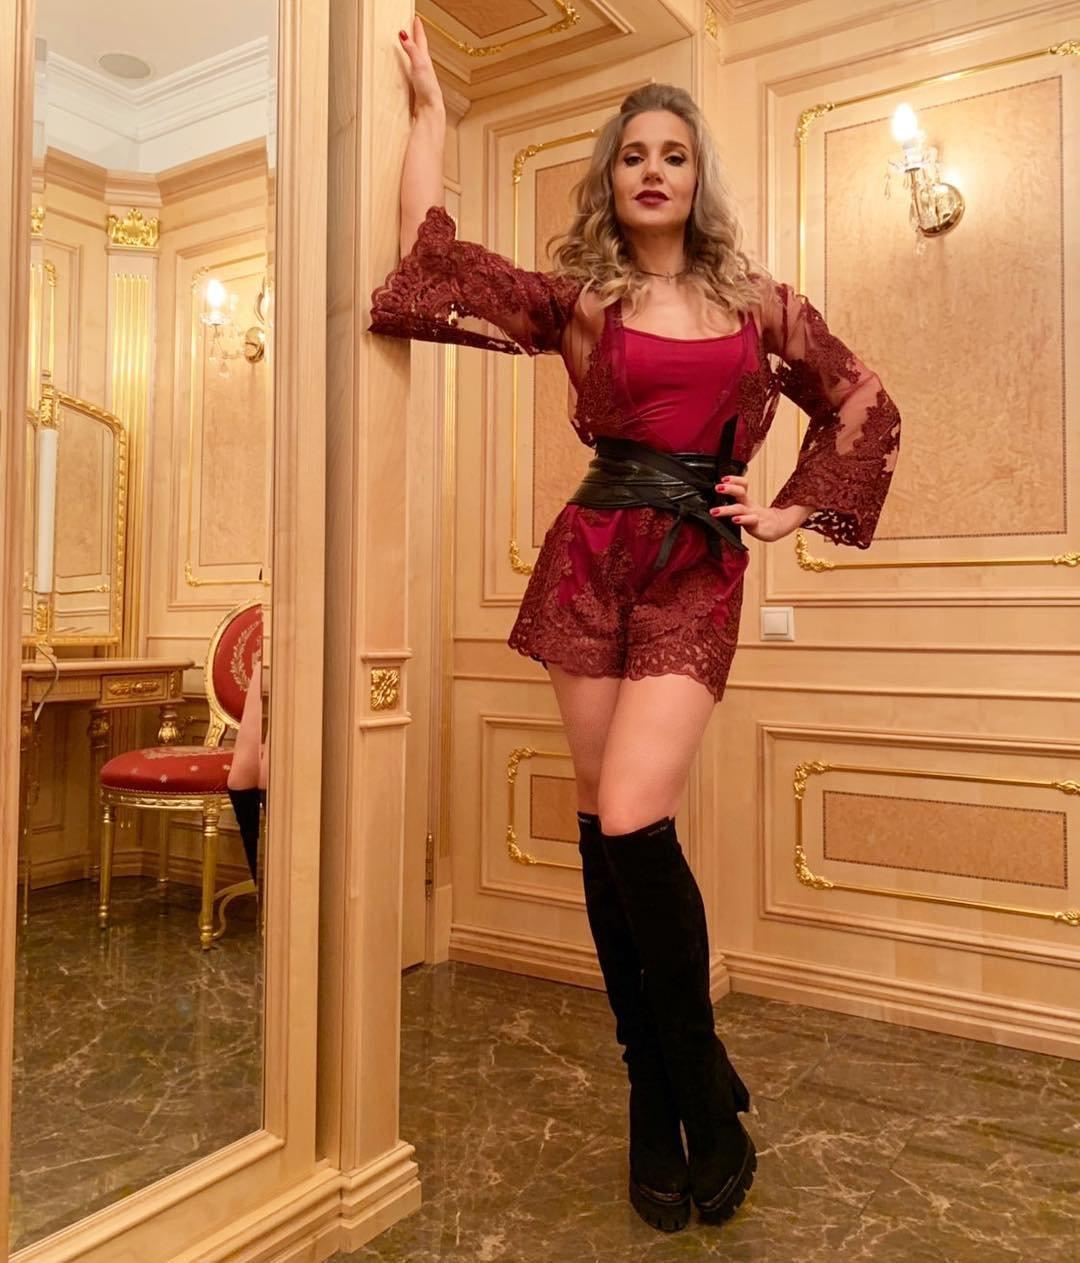 Instagram Julia Kovalchuk nudes (24 photo), Tits, Cleavage, Instagram, cleavage 2019